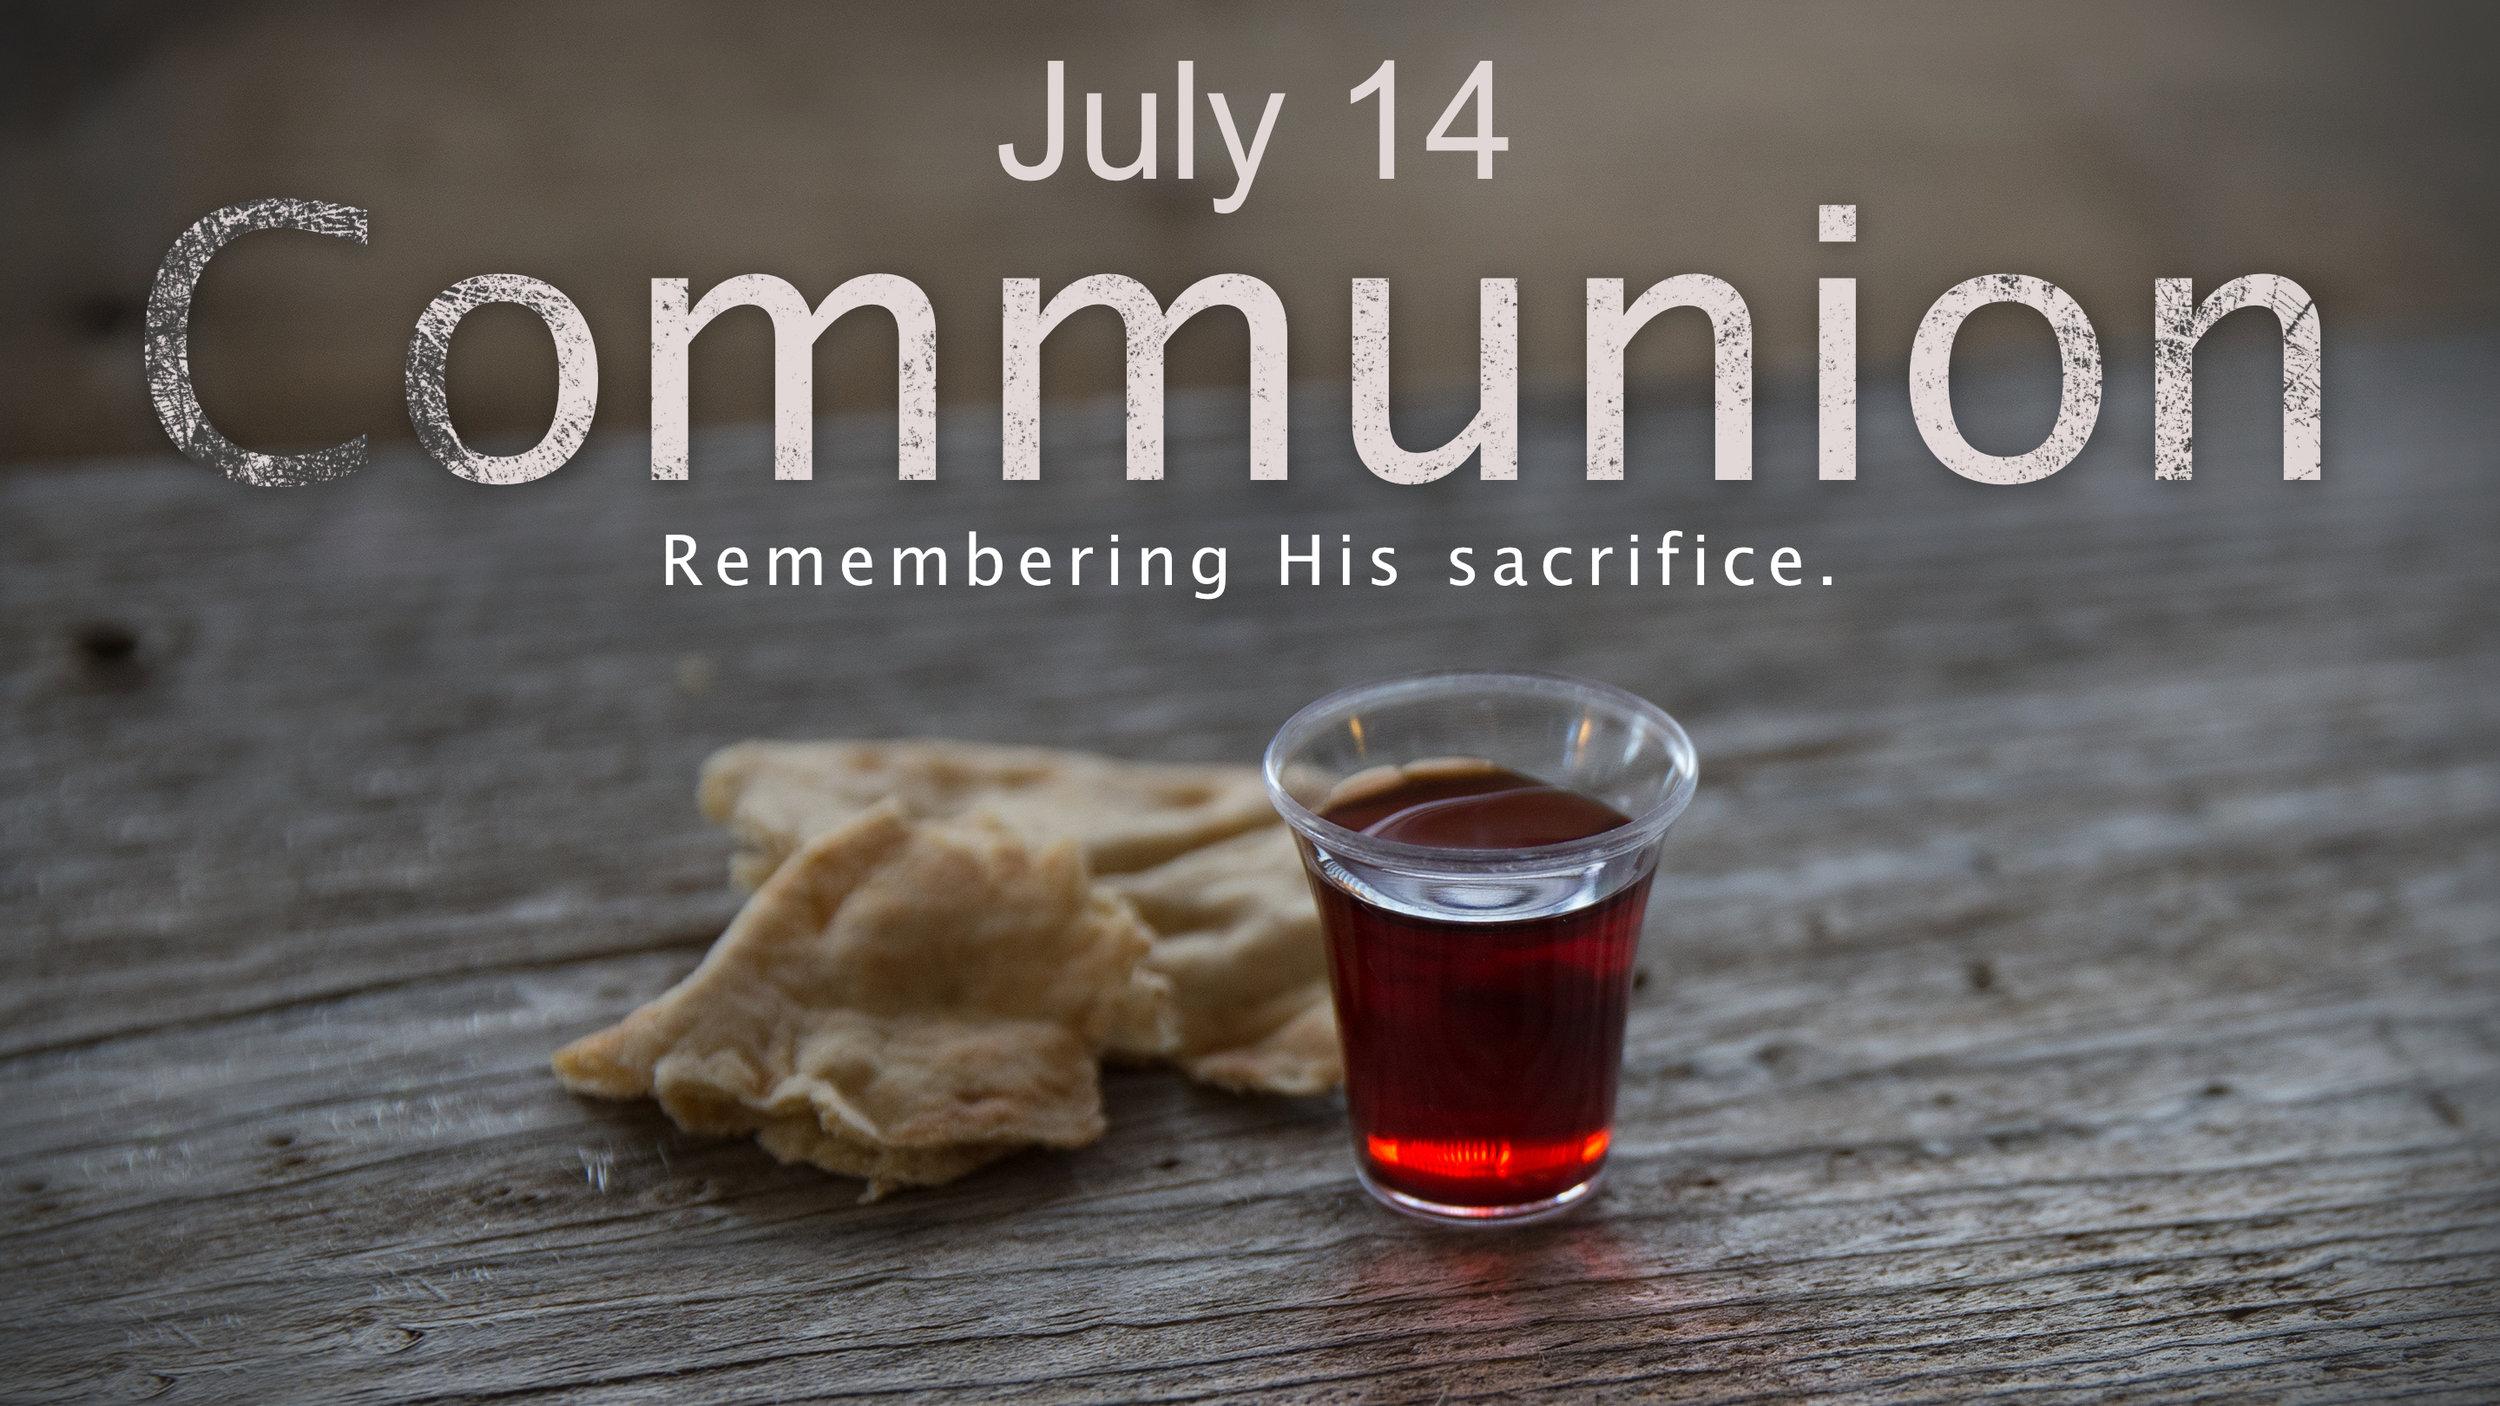 communion-July.jpg